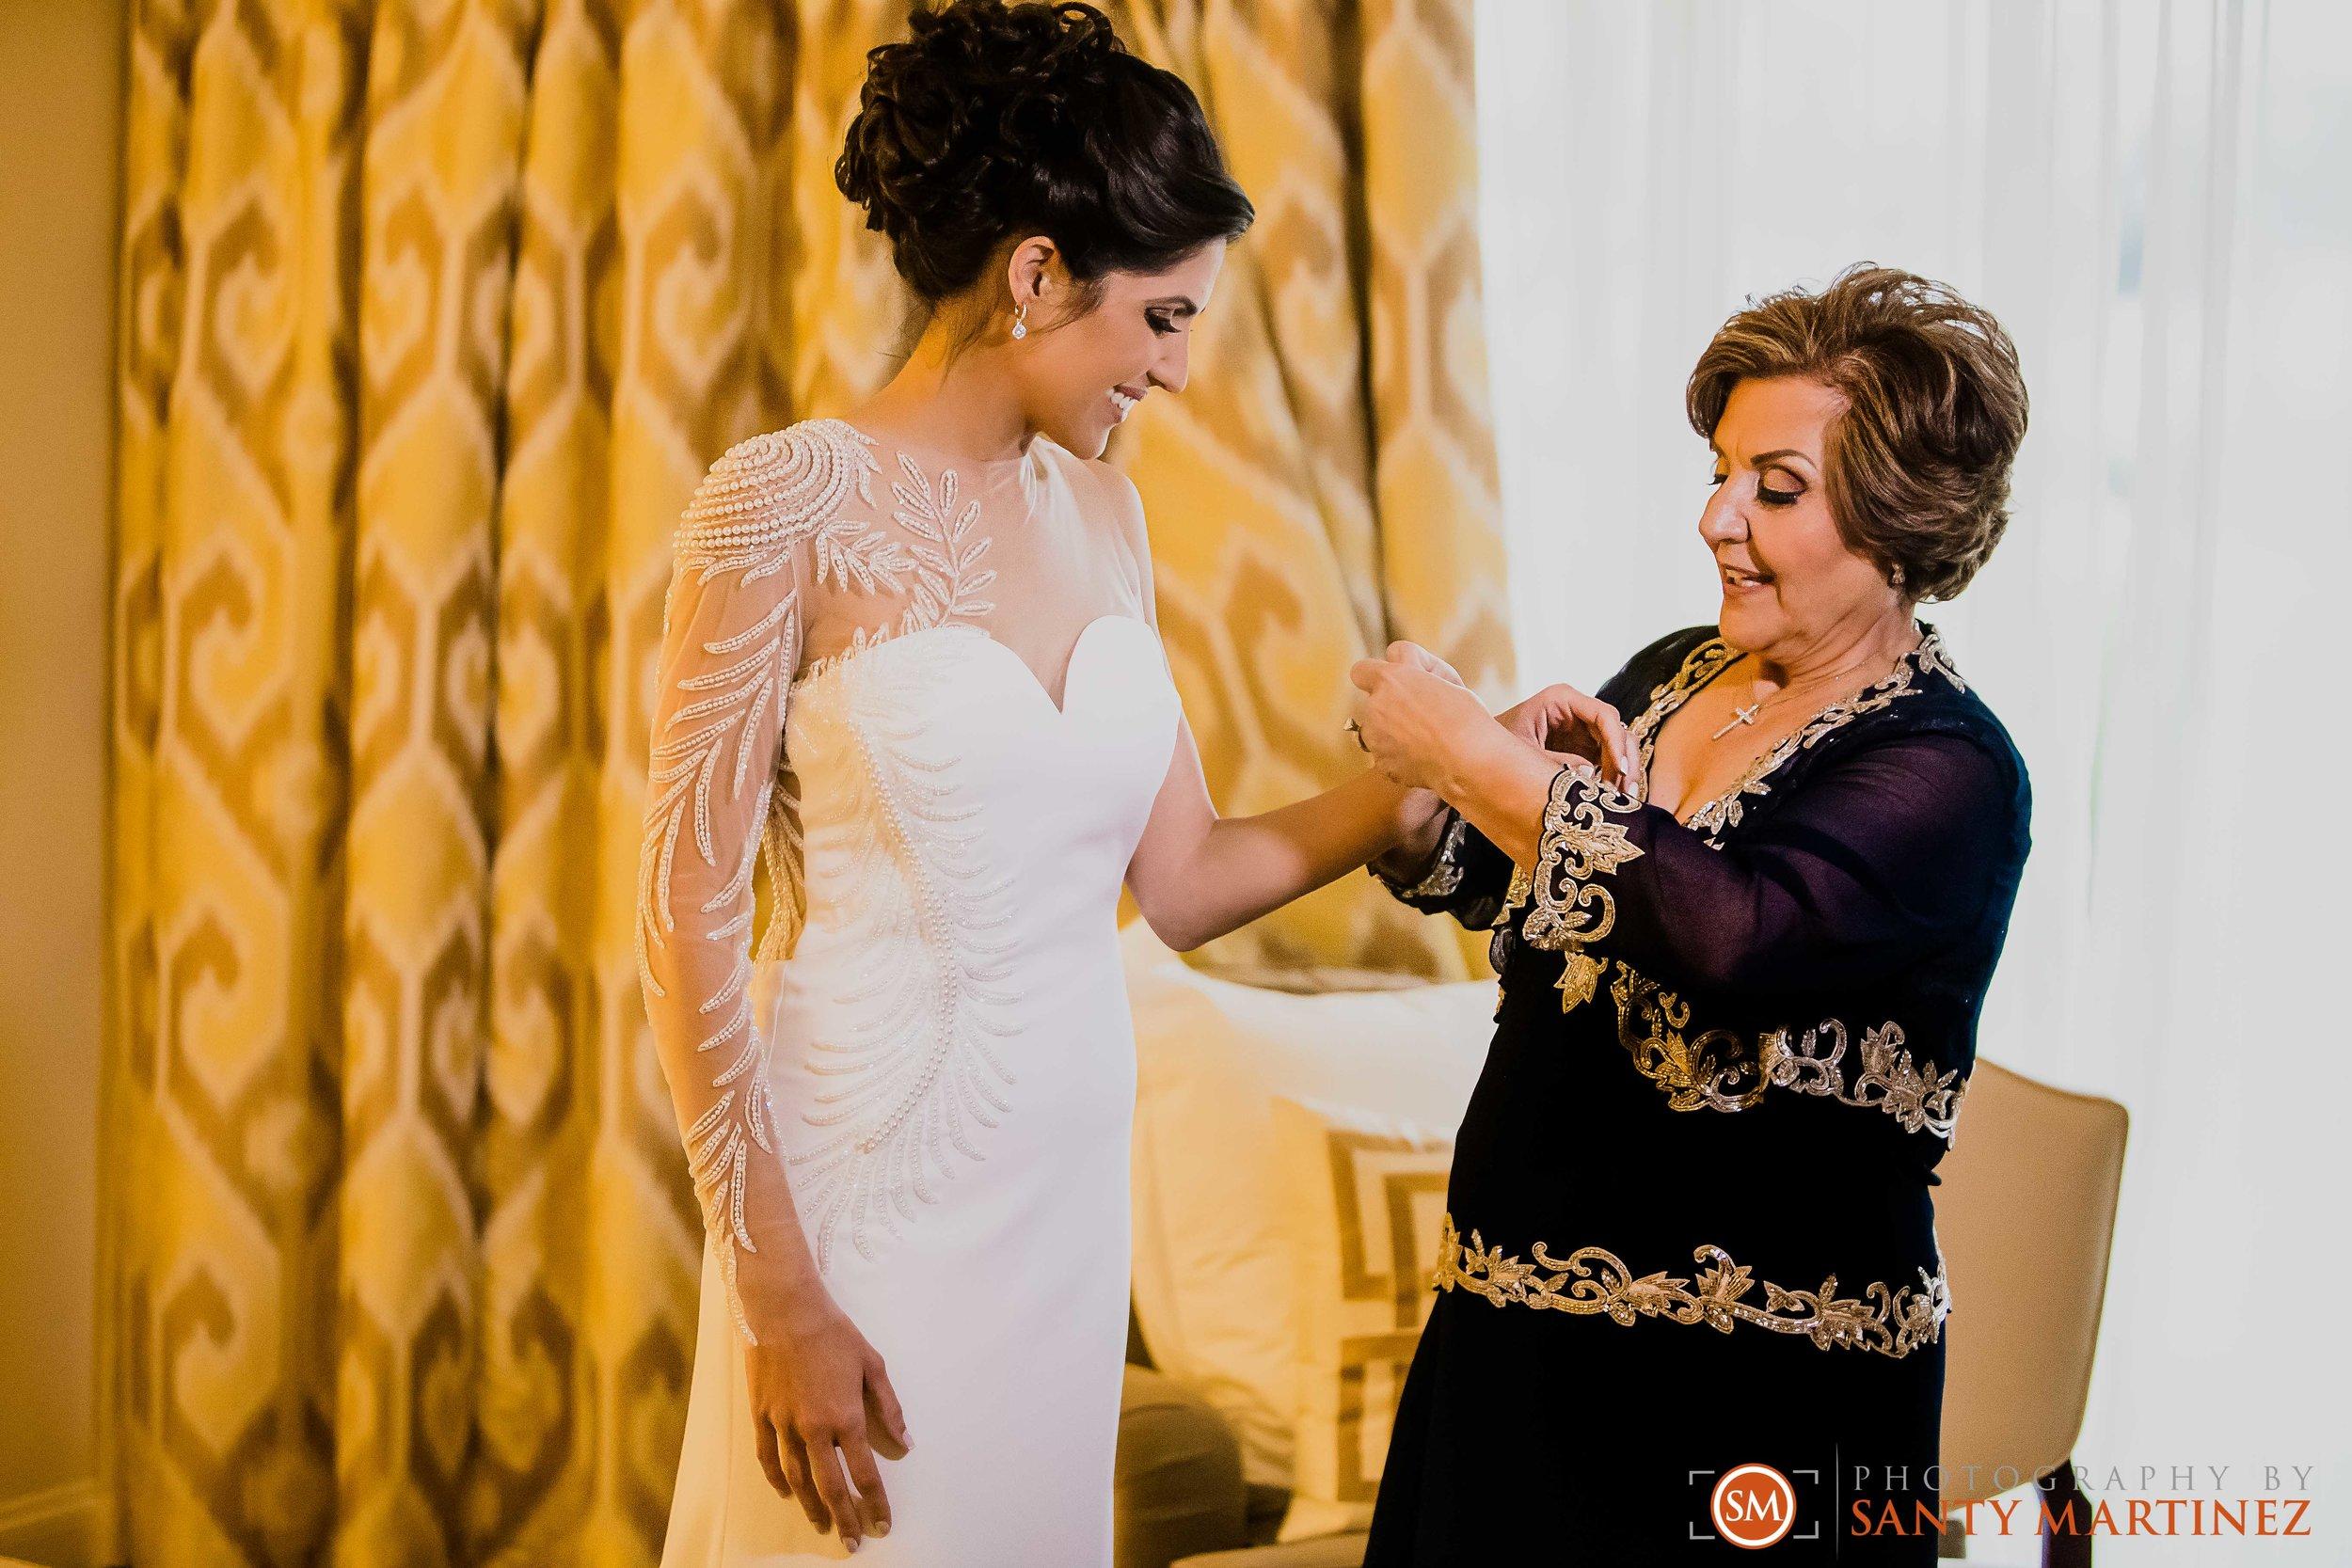 Wedding Trump National Doral Miami - Photography by Santy Martinez-9.jpg